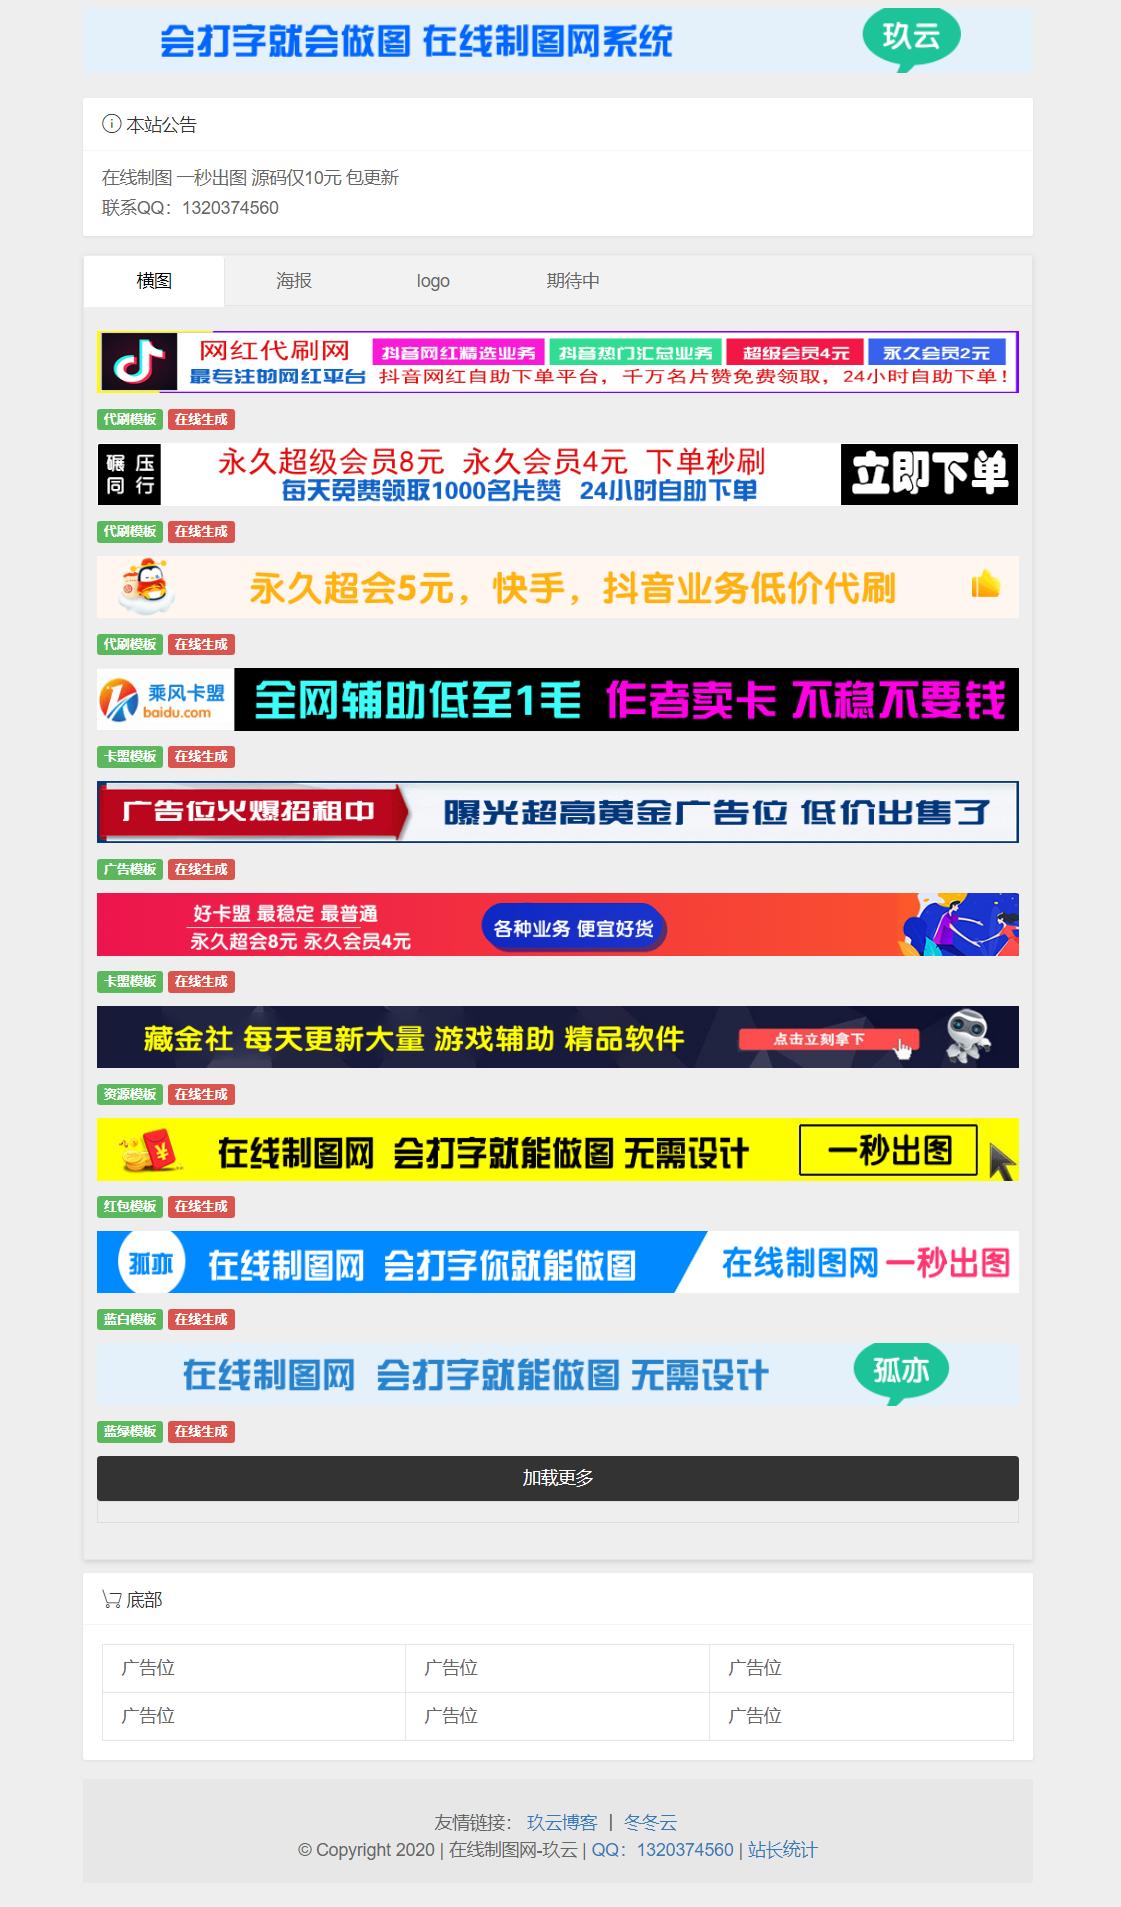 JY在线制图系统免费源码丨一秒生成广告横图海报图-玖居暗巷